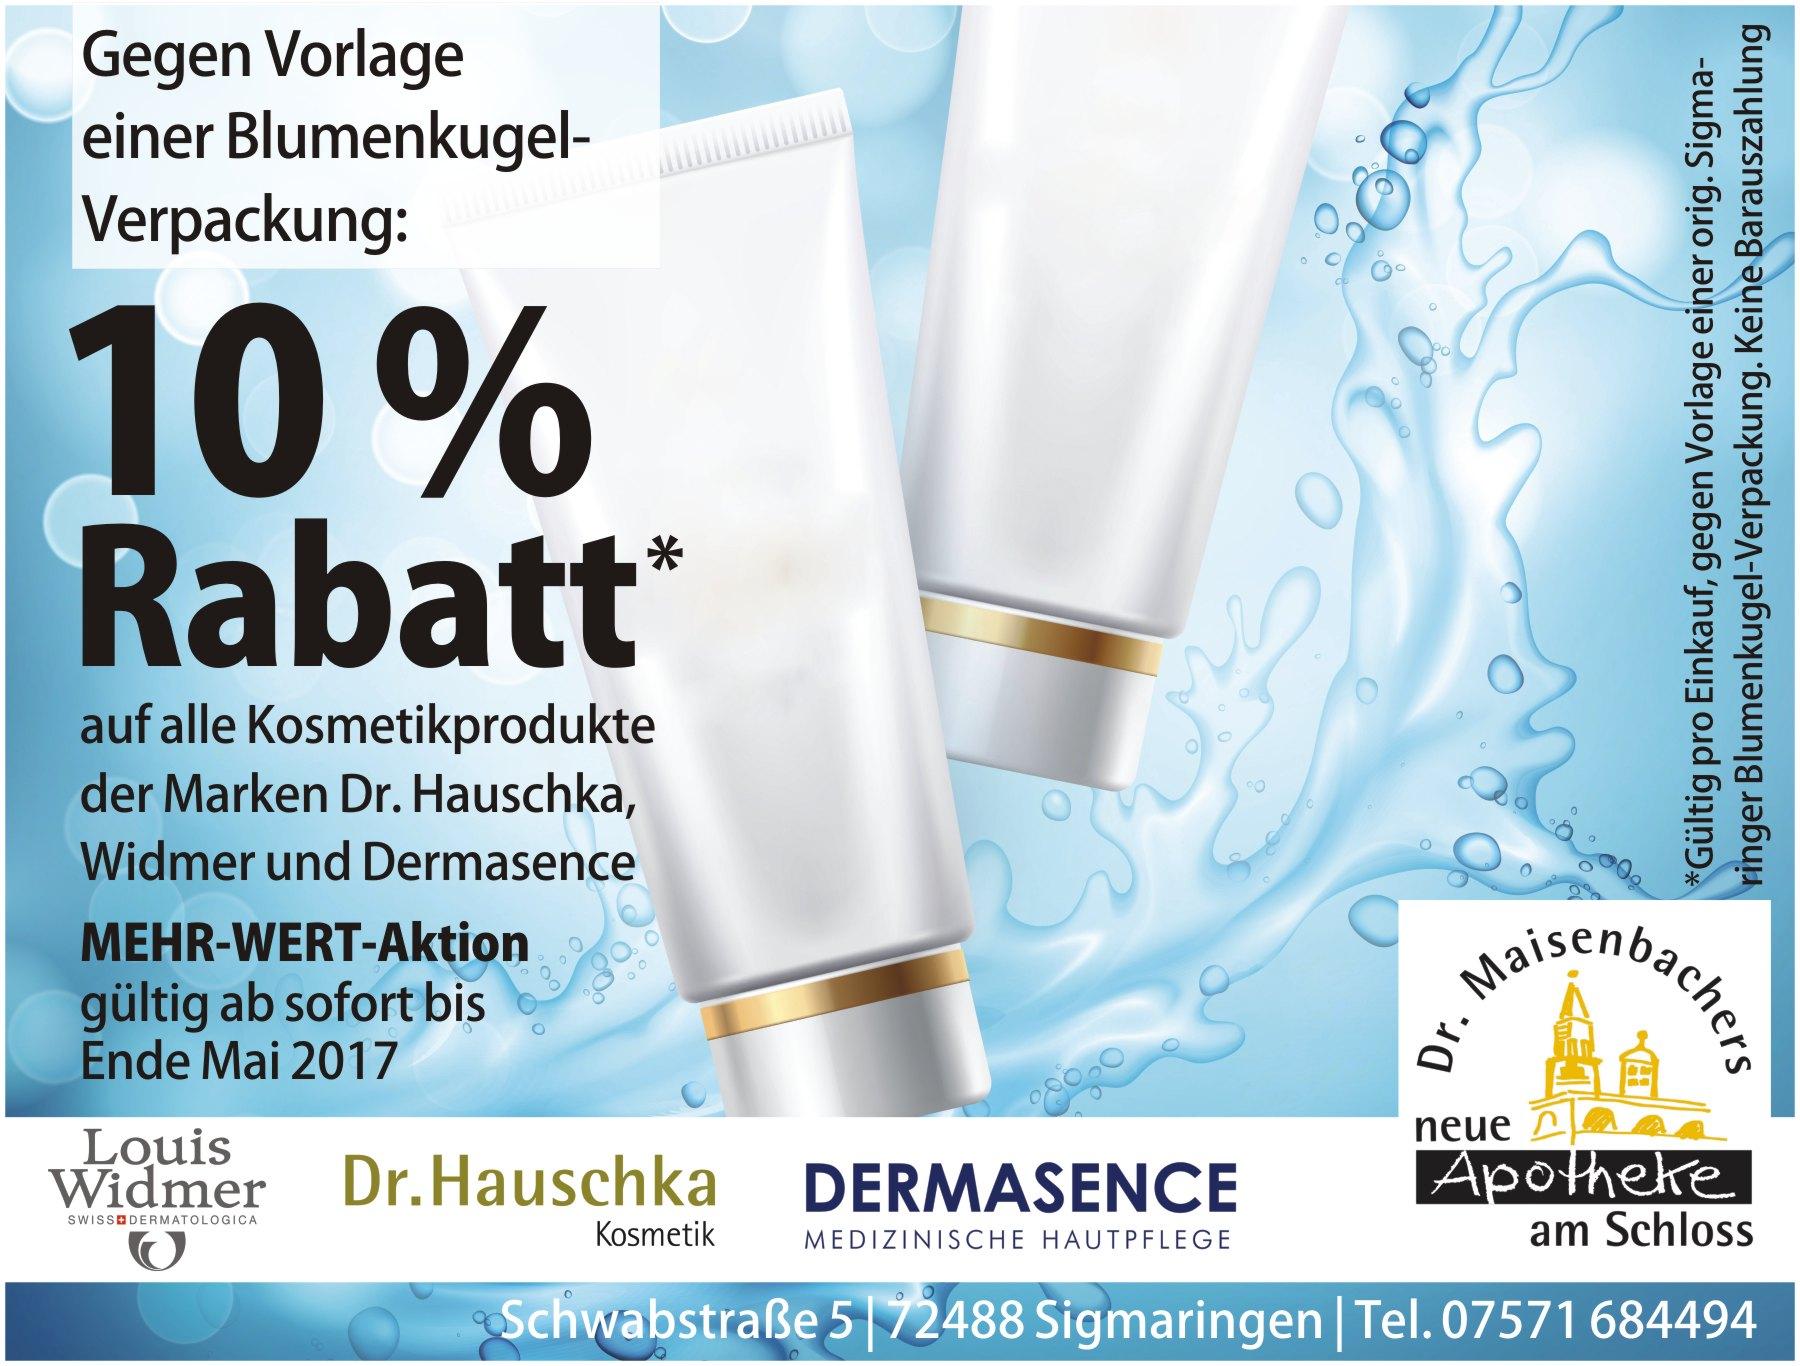 drmaisenbacherapotheke-mehrwert